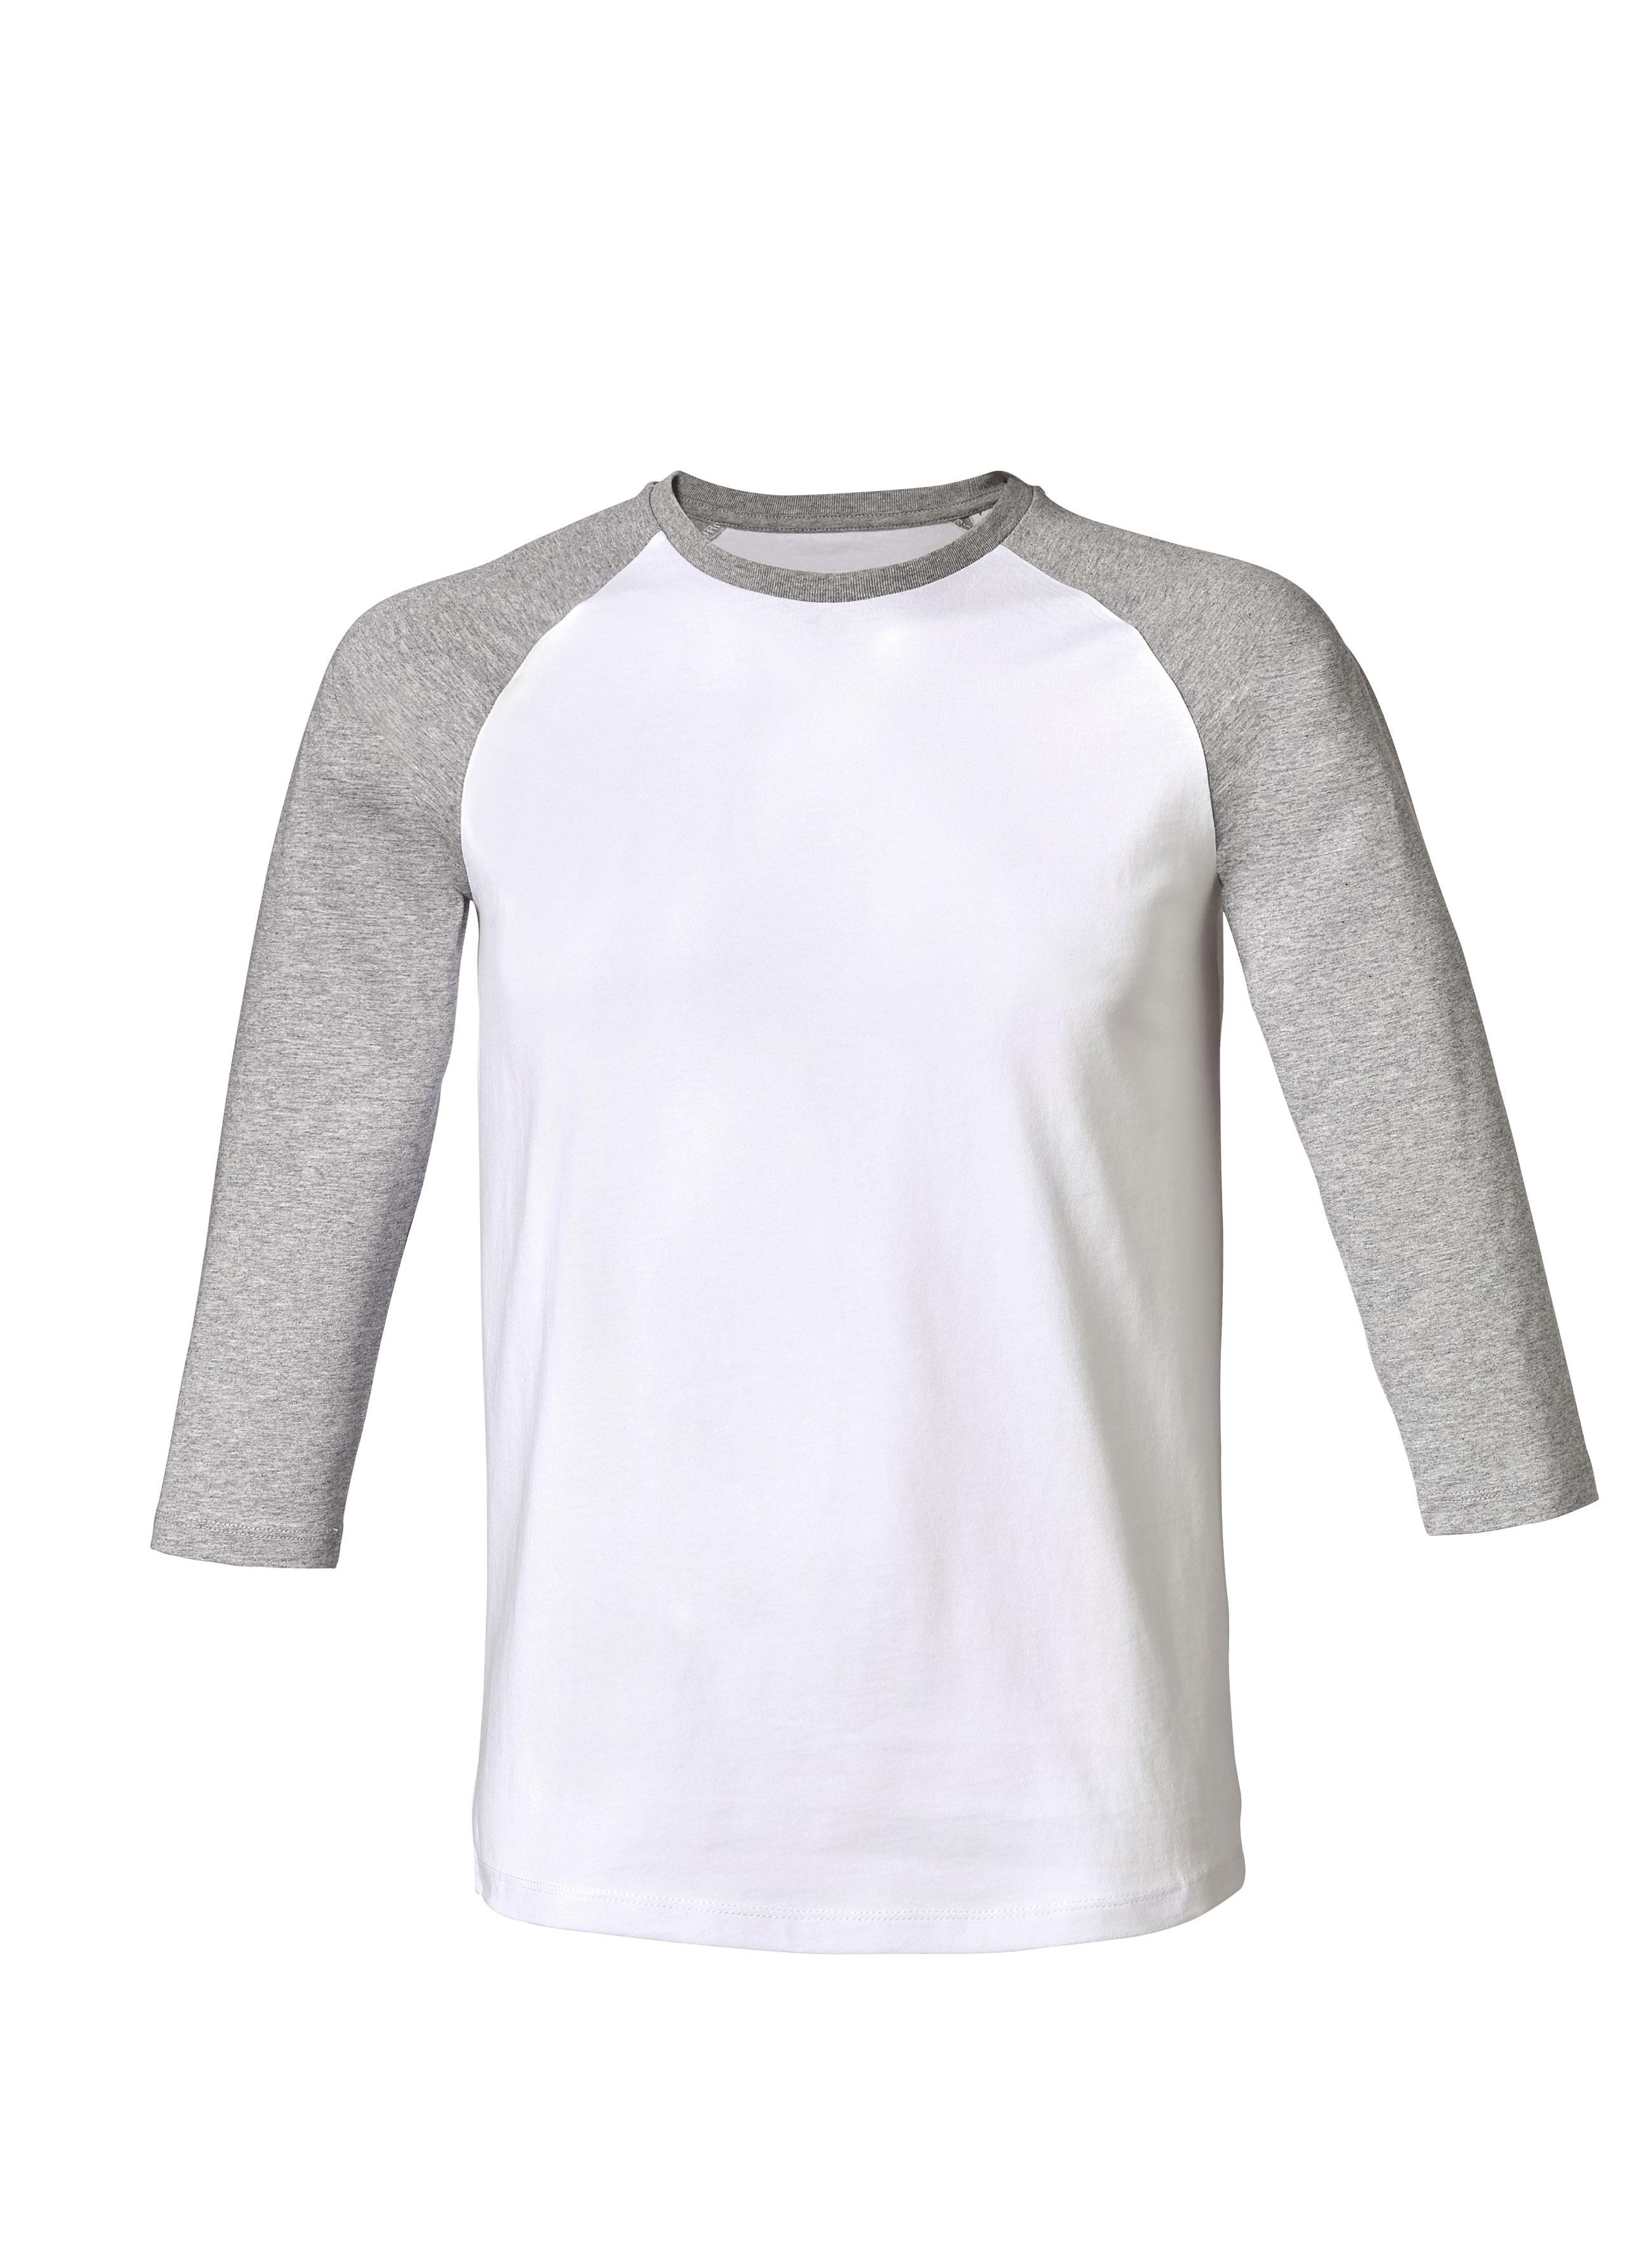 white - heather grey